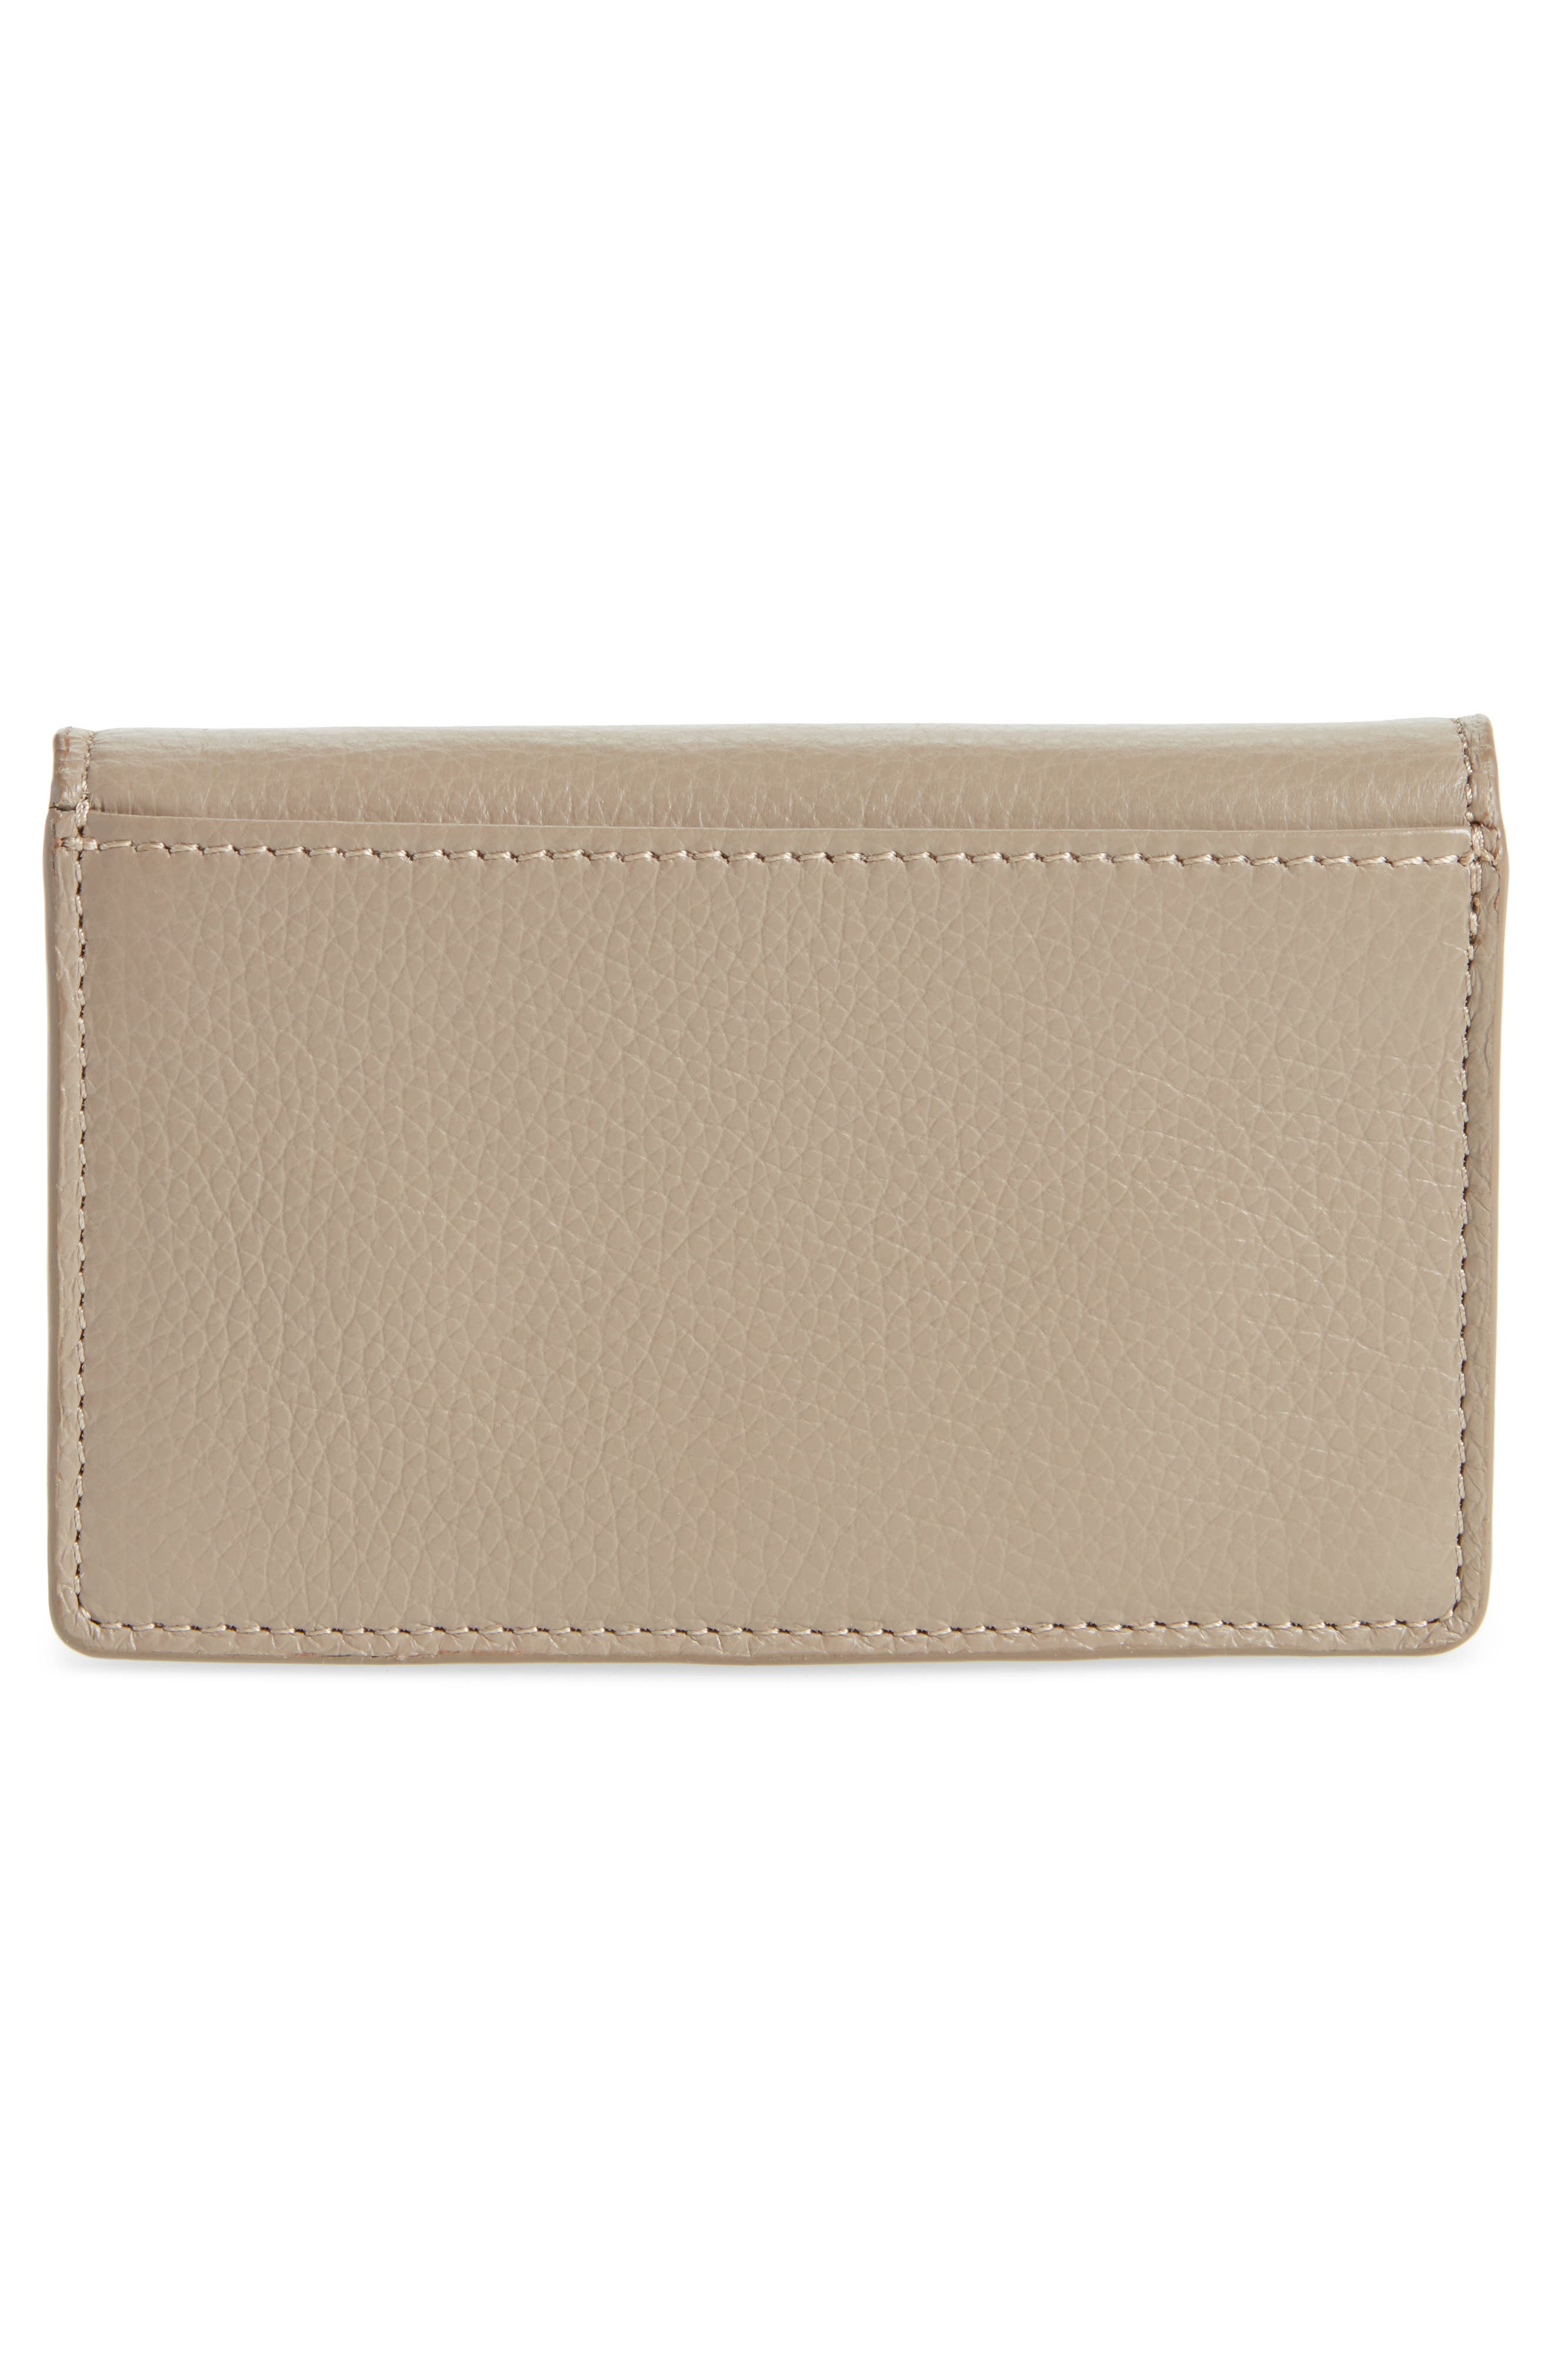 Kriss Grommet Leather Card Wallet,                             Alternate thumbnail 3, color,                             020